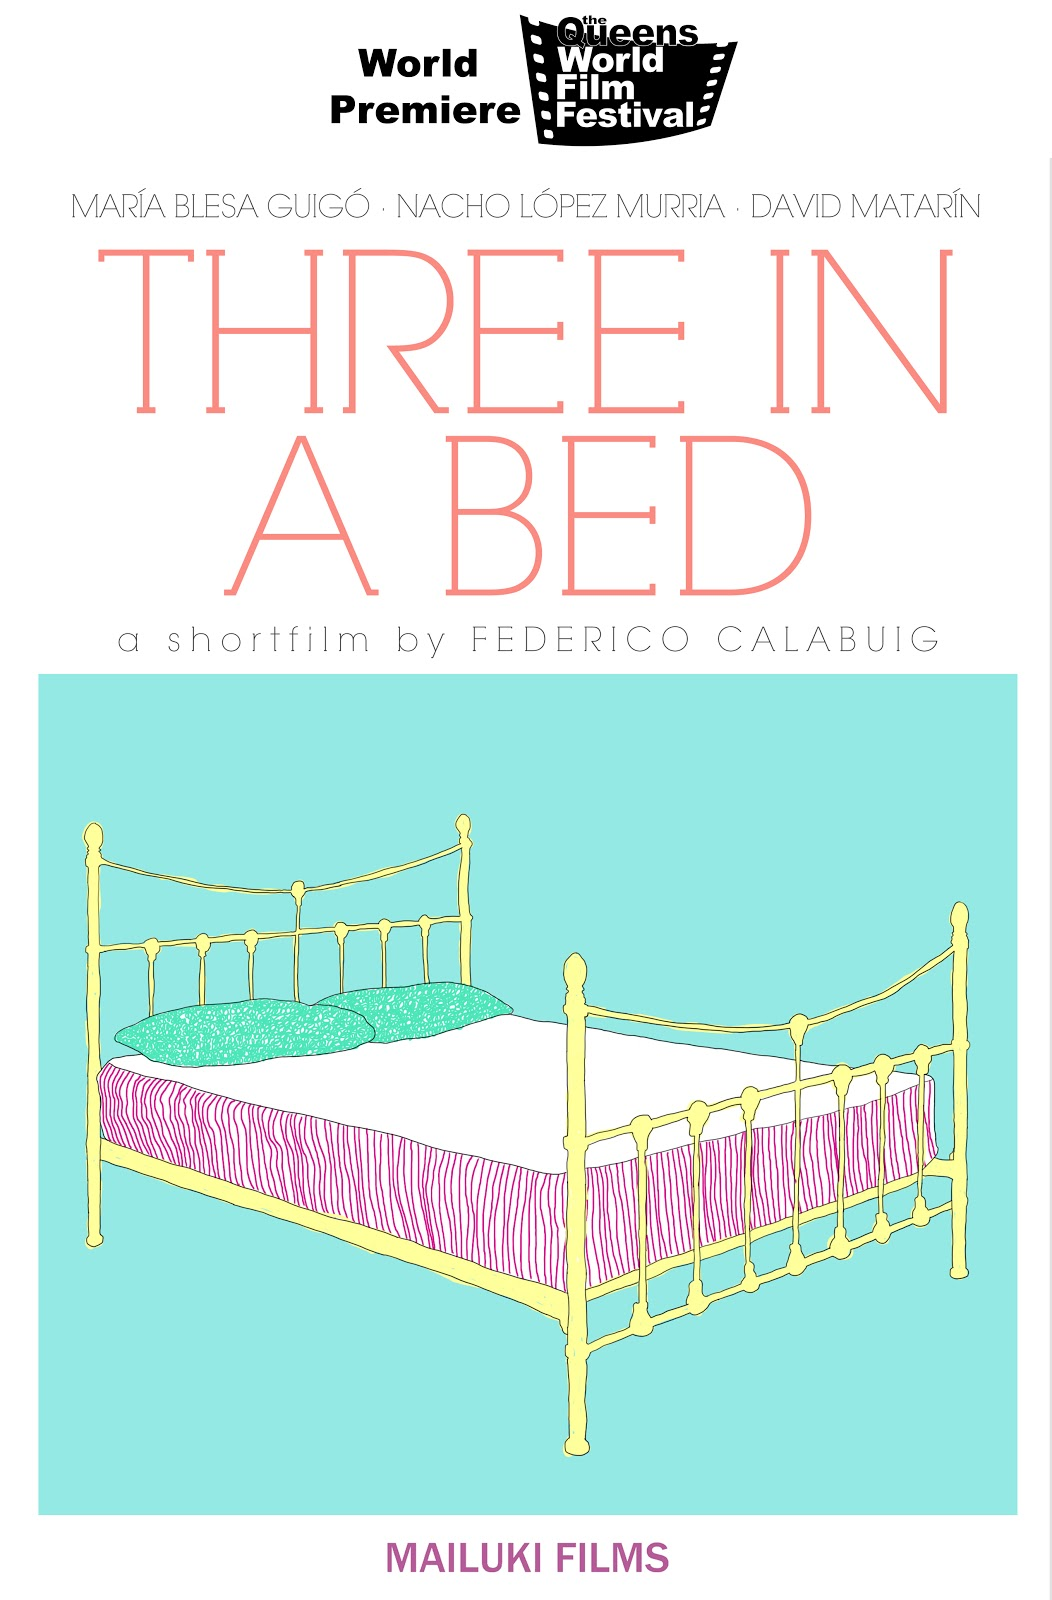 http://3.bp.blogspot.com/-Vn0V3XQxfEw/UTZOcaE9iiI/AAAAAAAADRU/2axmwPt1V88/s1600/Three+in+a+bed+premiere+poster.jpg